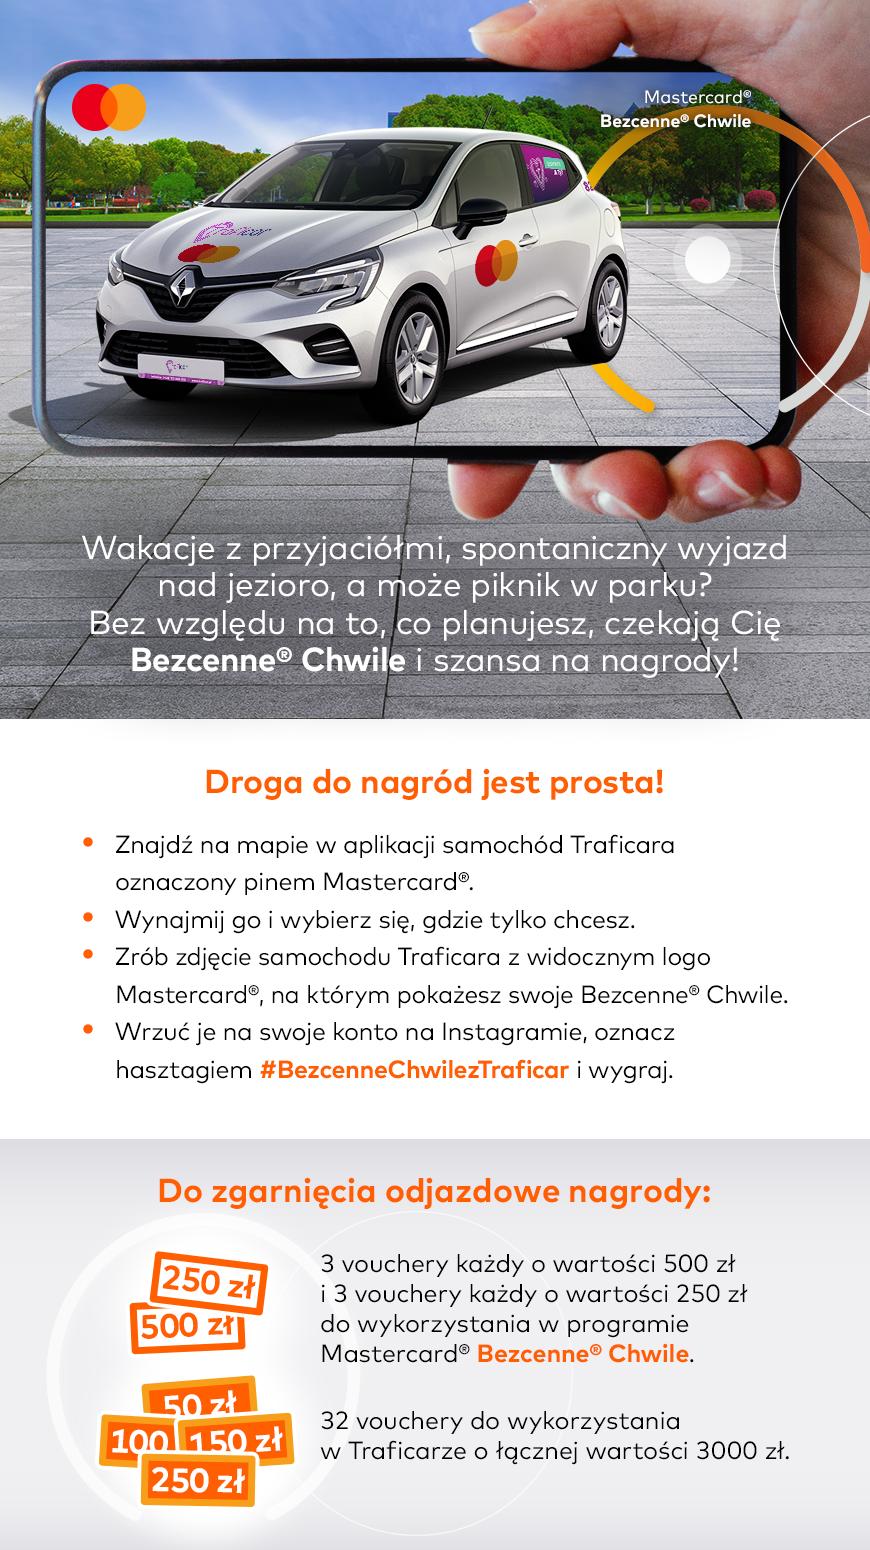 mc_traficar_infografika_05-08.png